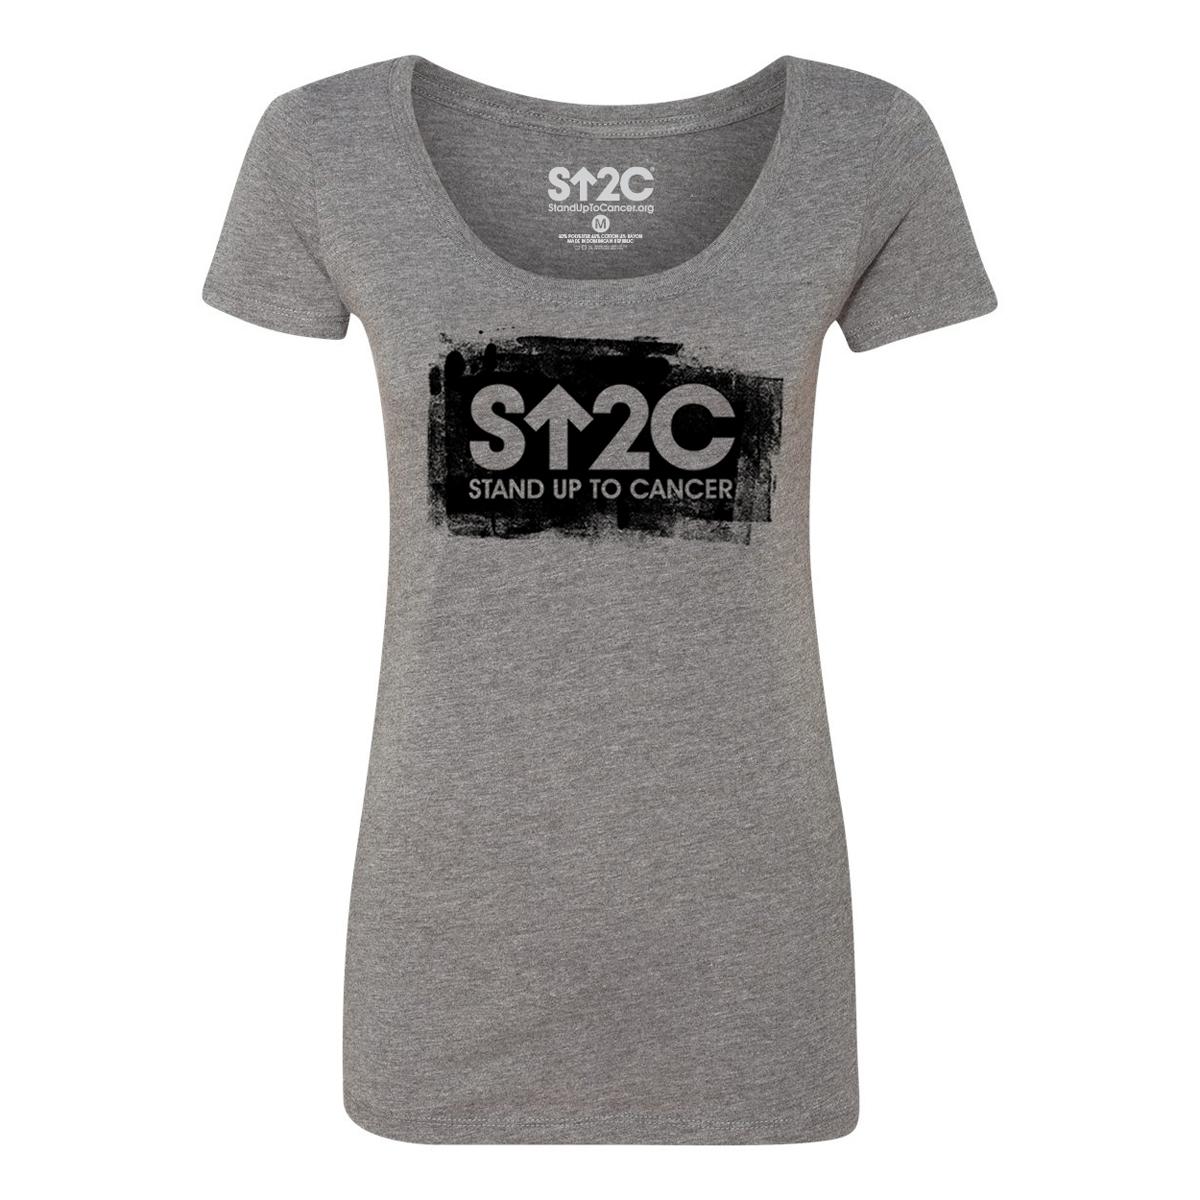 SU2C Short Logo Painted Women's Scoop T-shirt